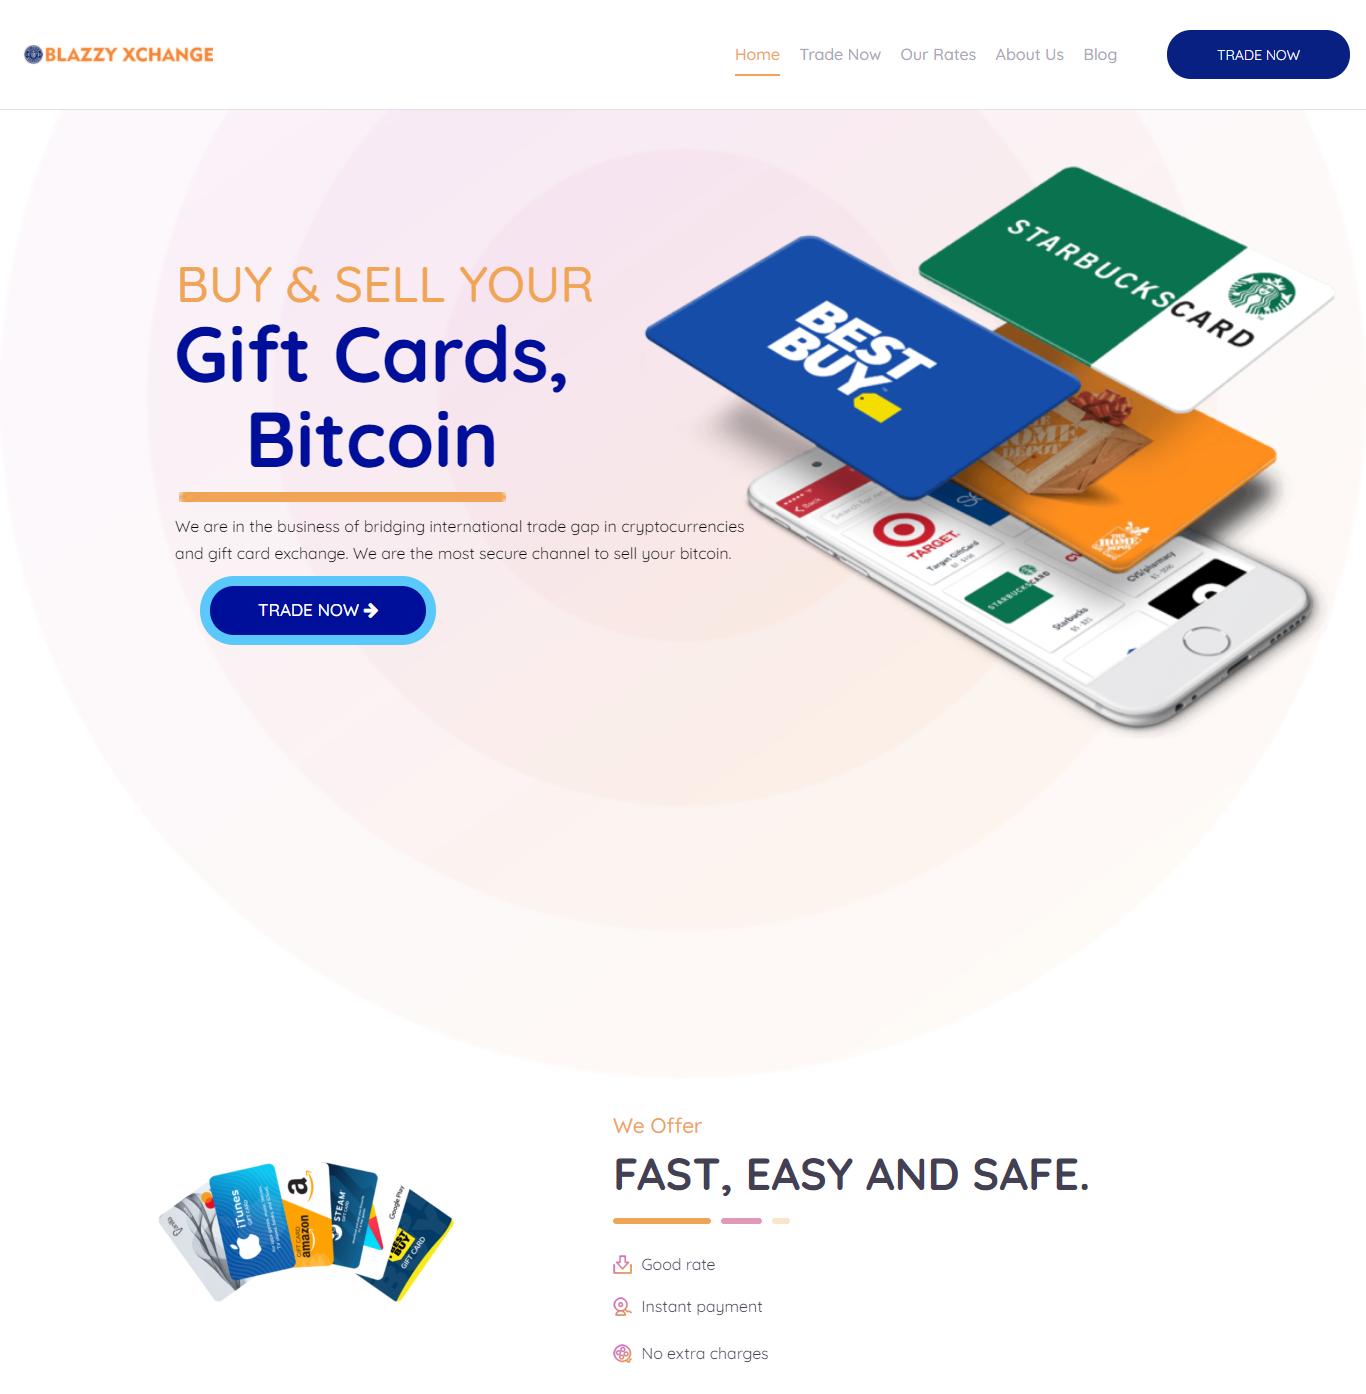 https://geniuscreations.com.ng/project/blazzyxchange-bitcoin-gift-cards-exchange-platform/